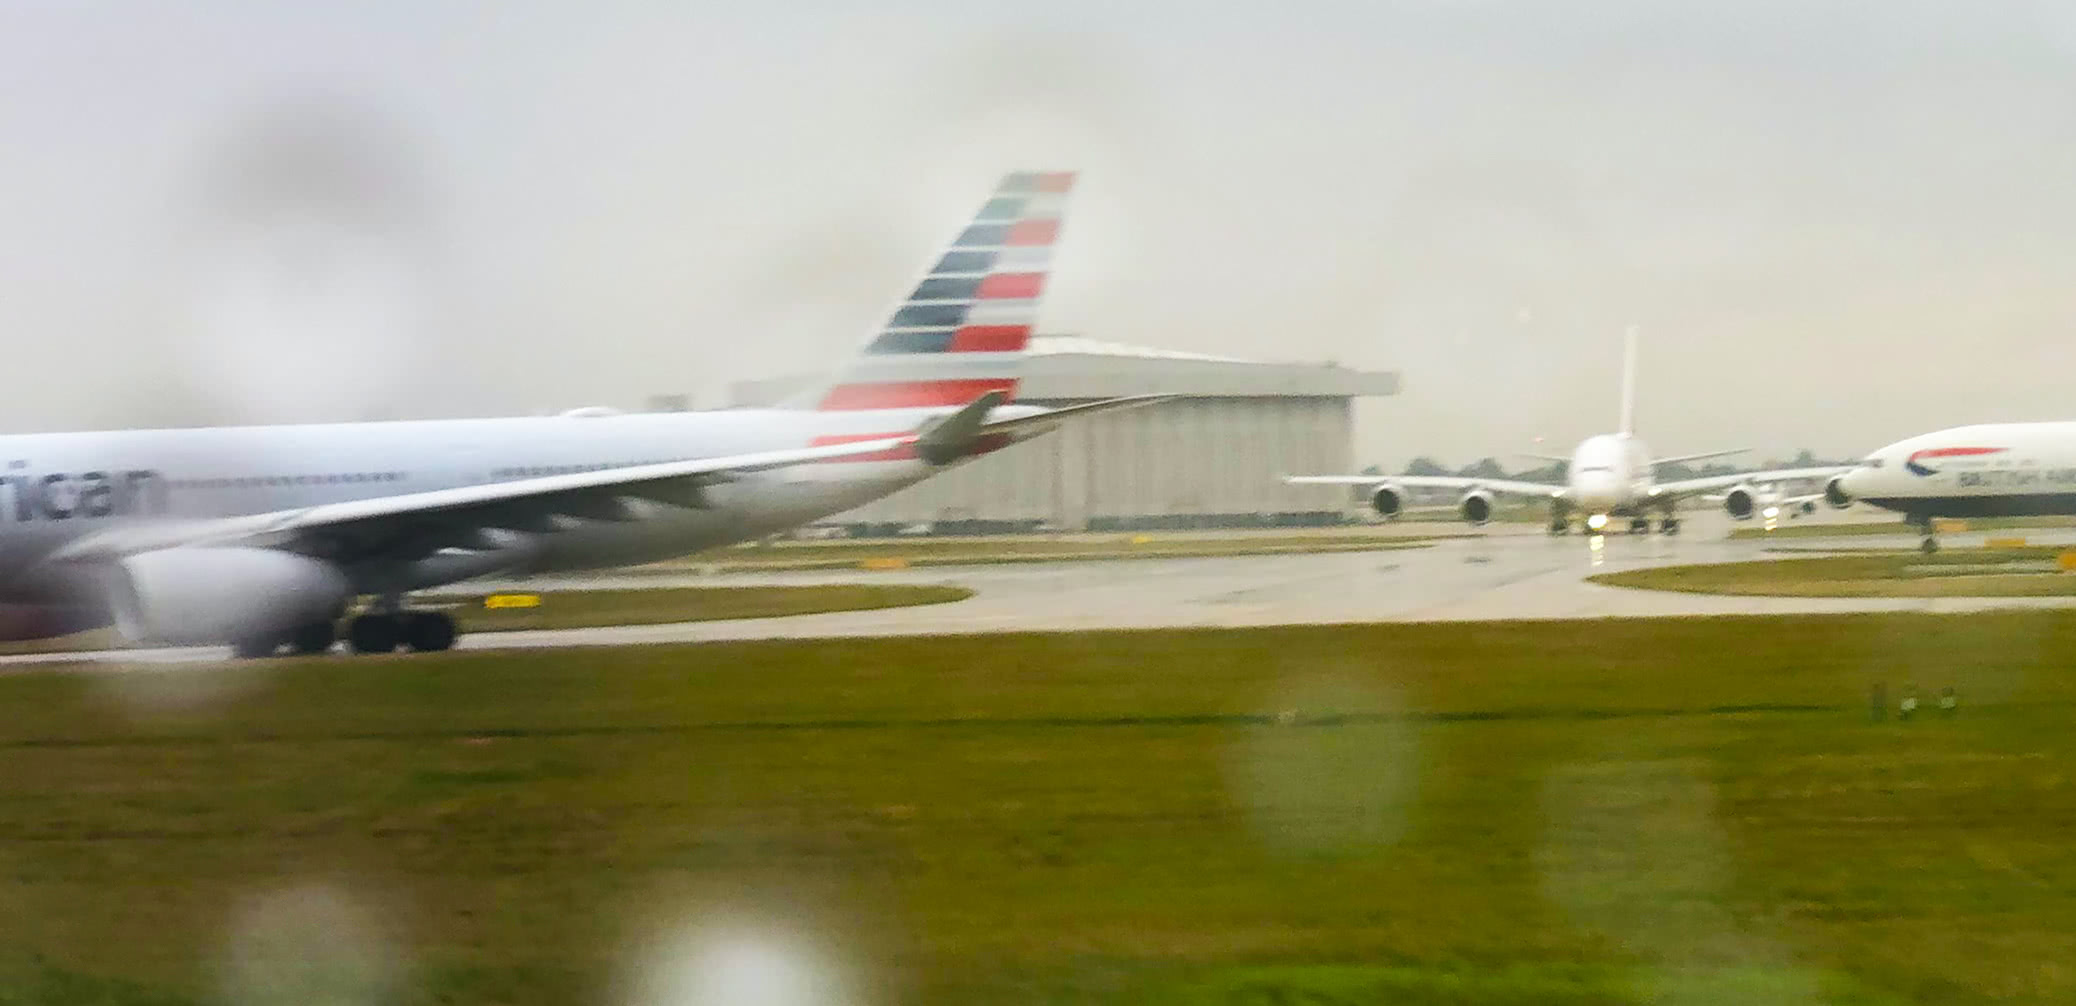 Best Airport Lounges At Las Vegas Airport (LAS)